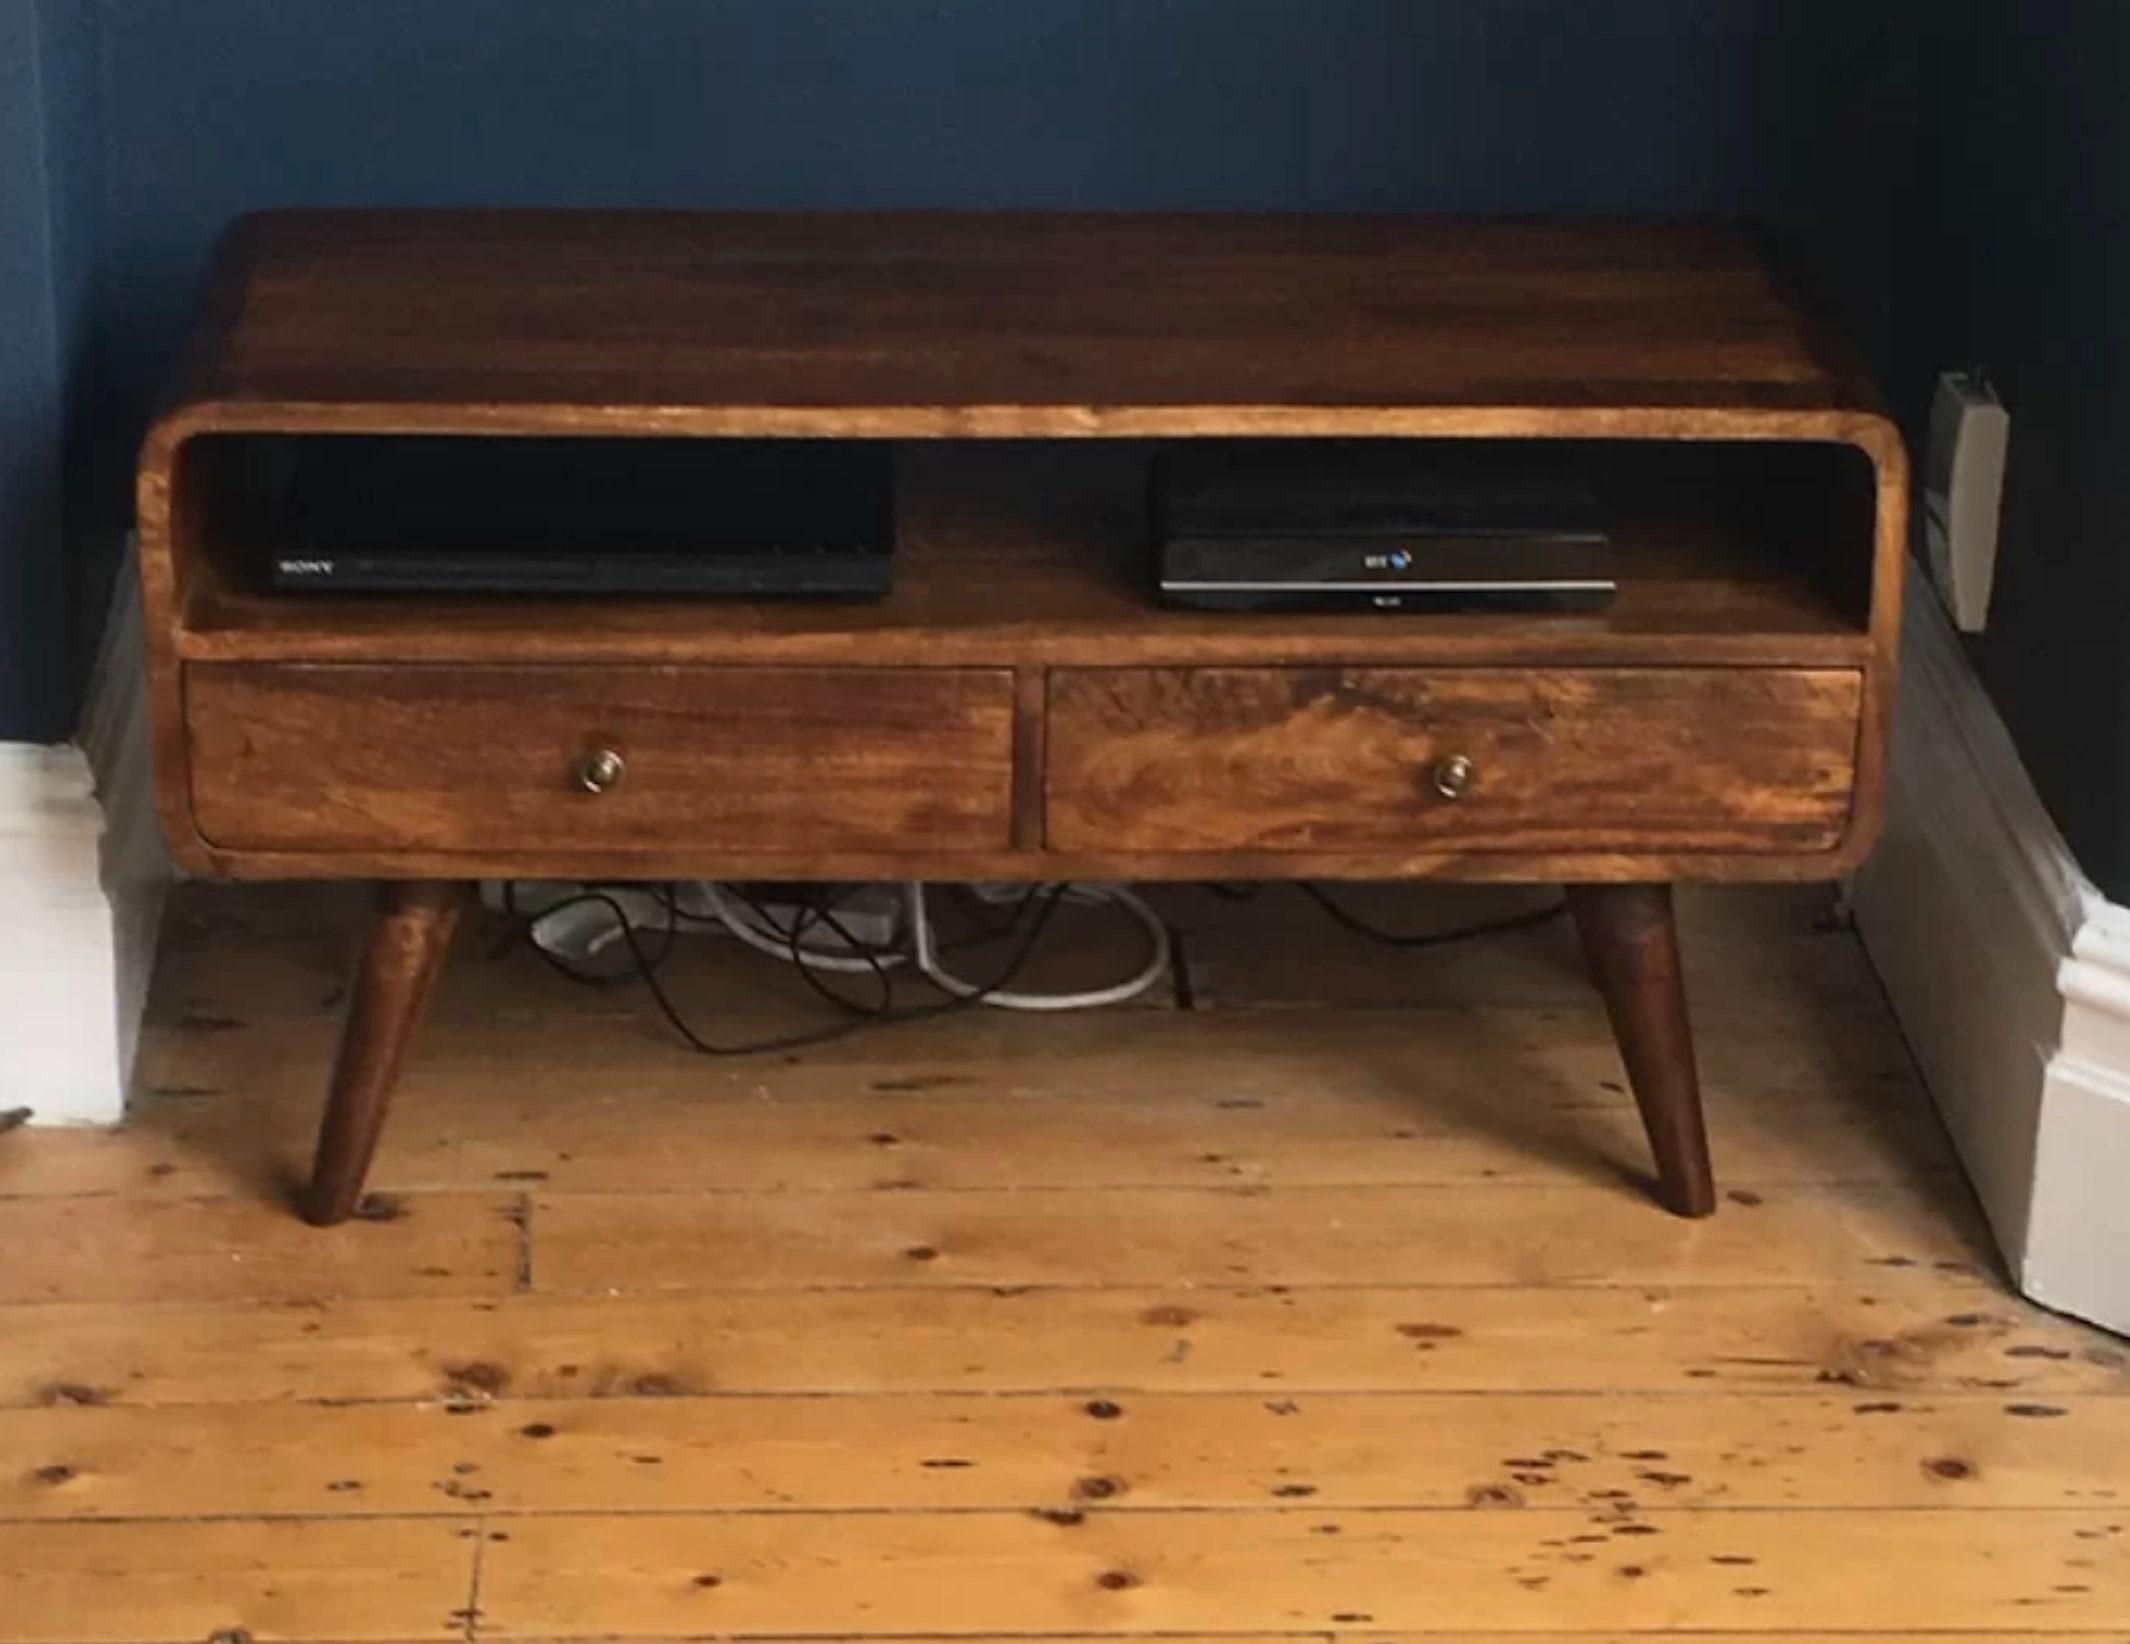 Mid Century TV Stand Modern Scandinavian Style Vintage Media Cabinet Rustic Solid Wood Unit 2 Drawers Large Shelf Lowboard Danish Nordic Leg